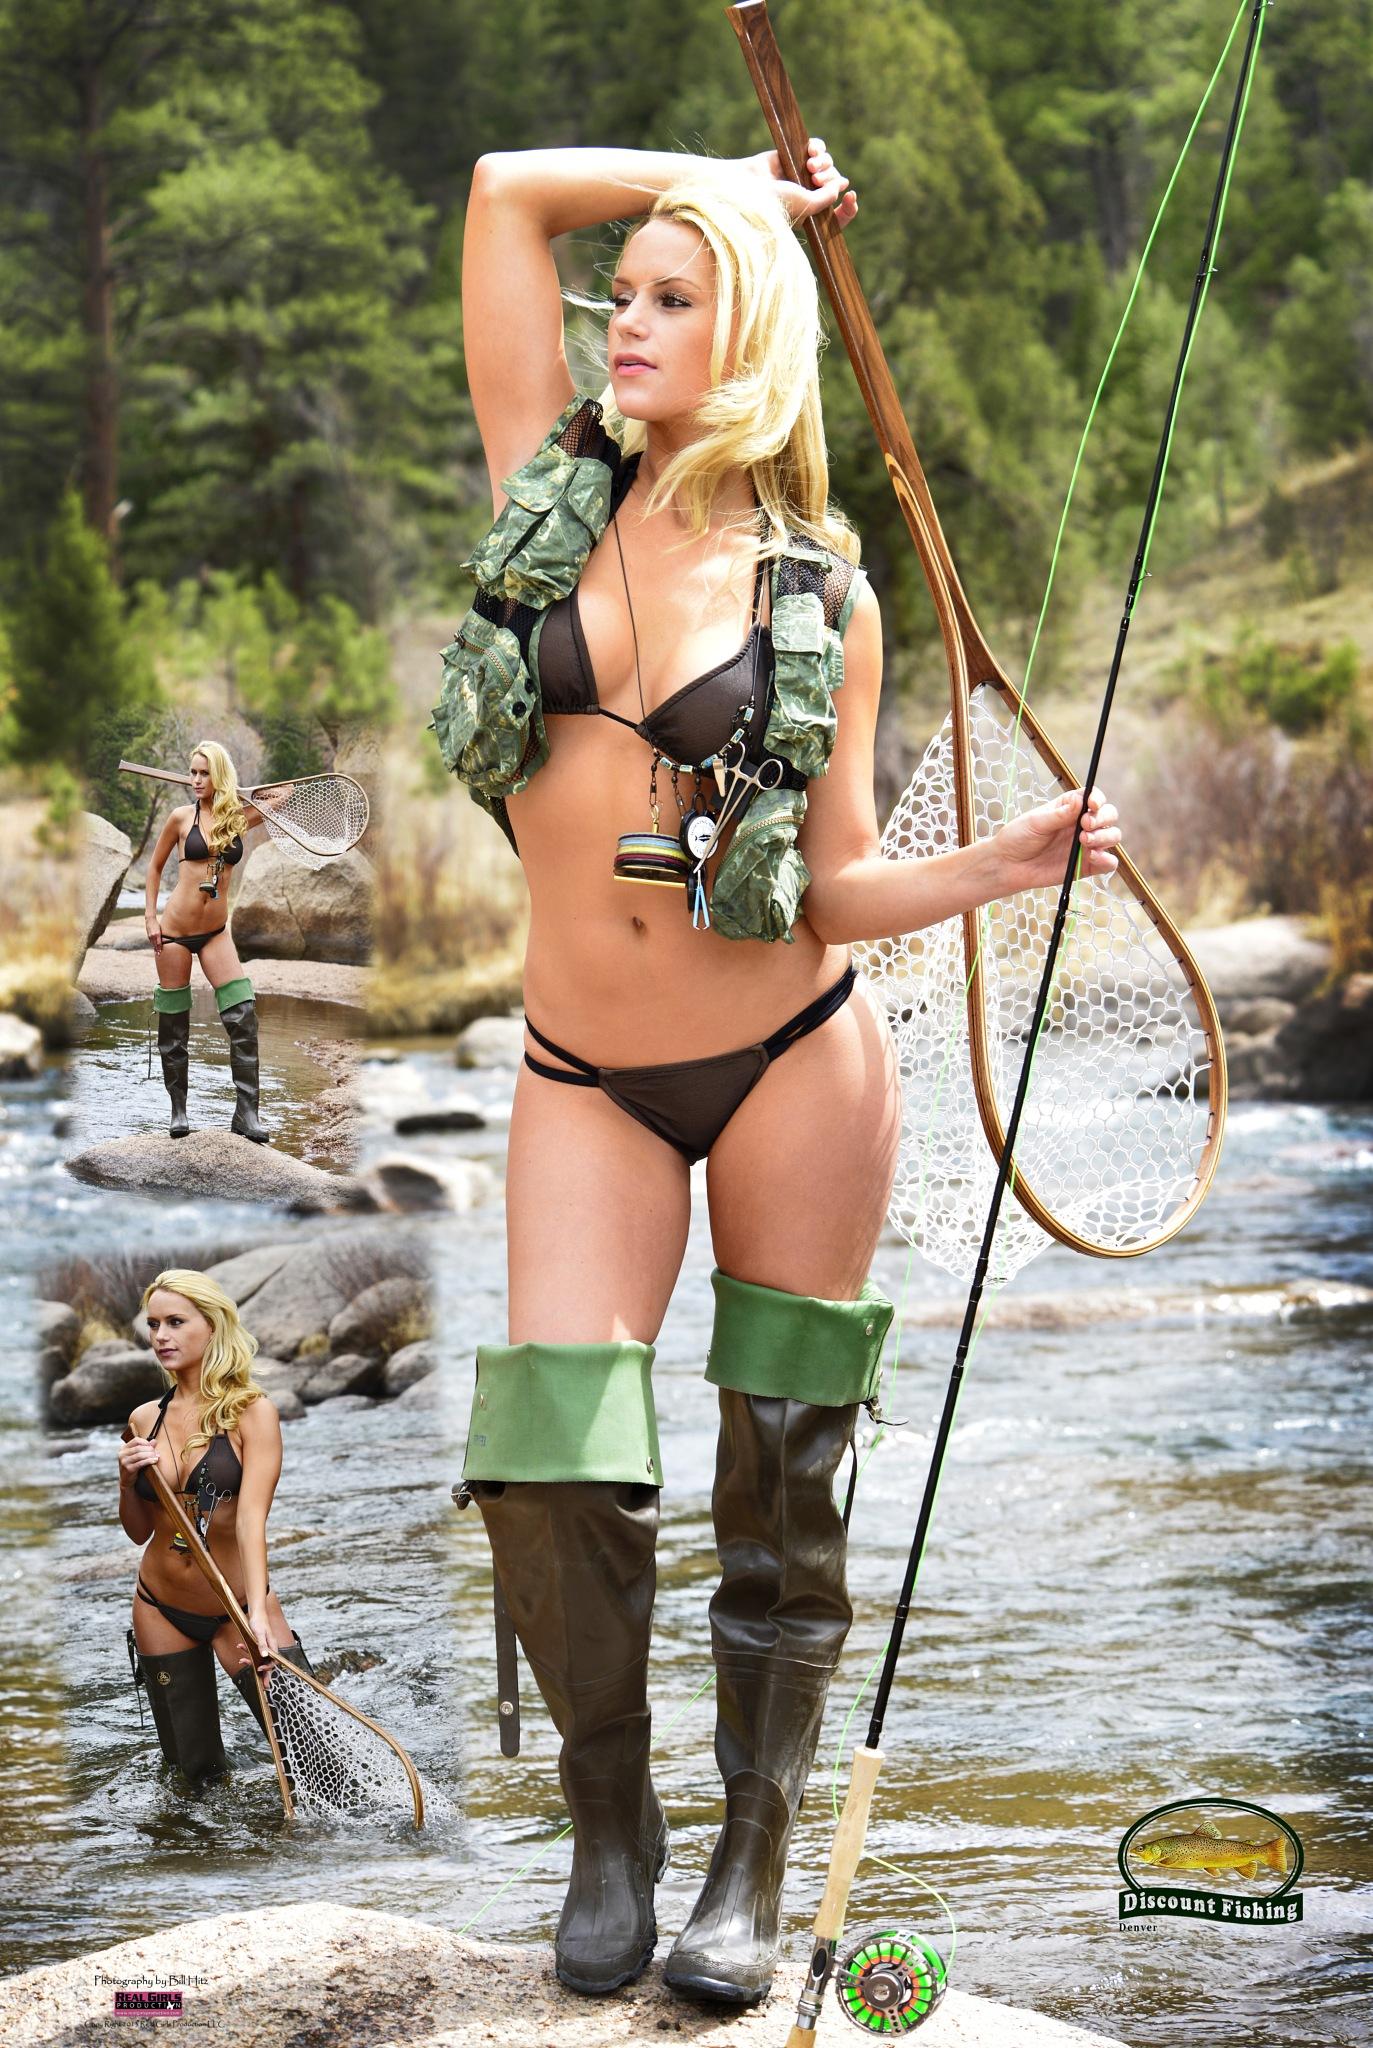 LET GO FISHING by Bill Hitz